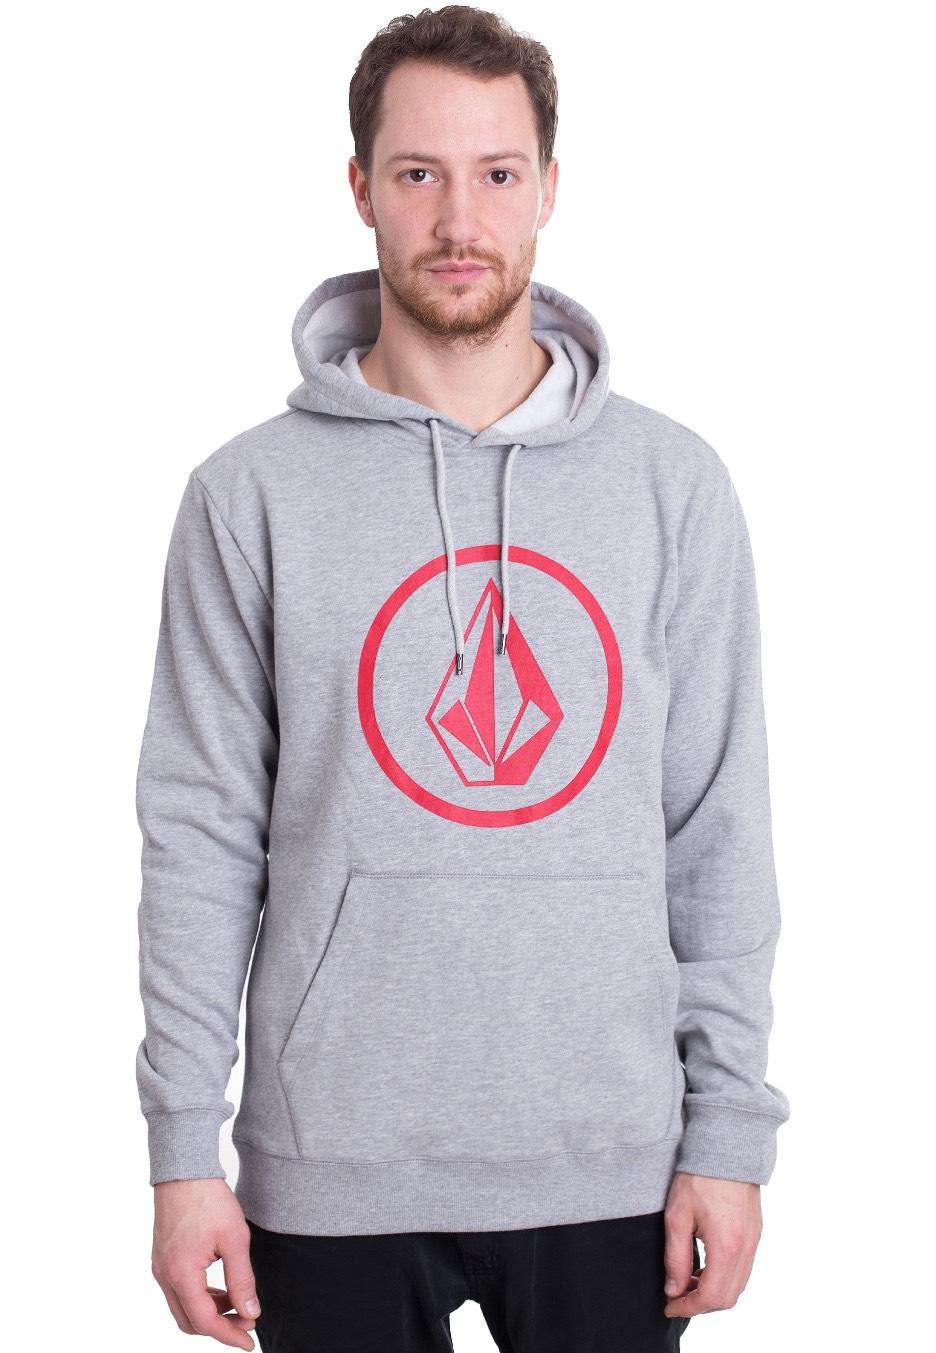 575c1575d61d71 Volcom - Stone Grey - Hoodie - Streetwear Shop - Impericon.com DE